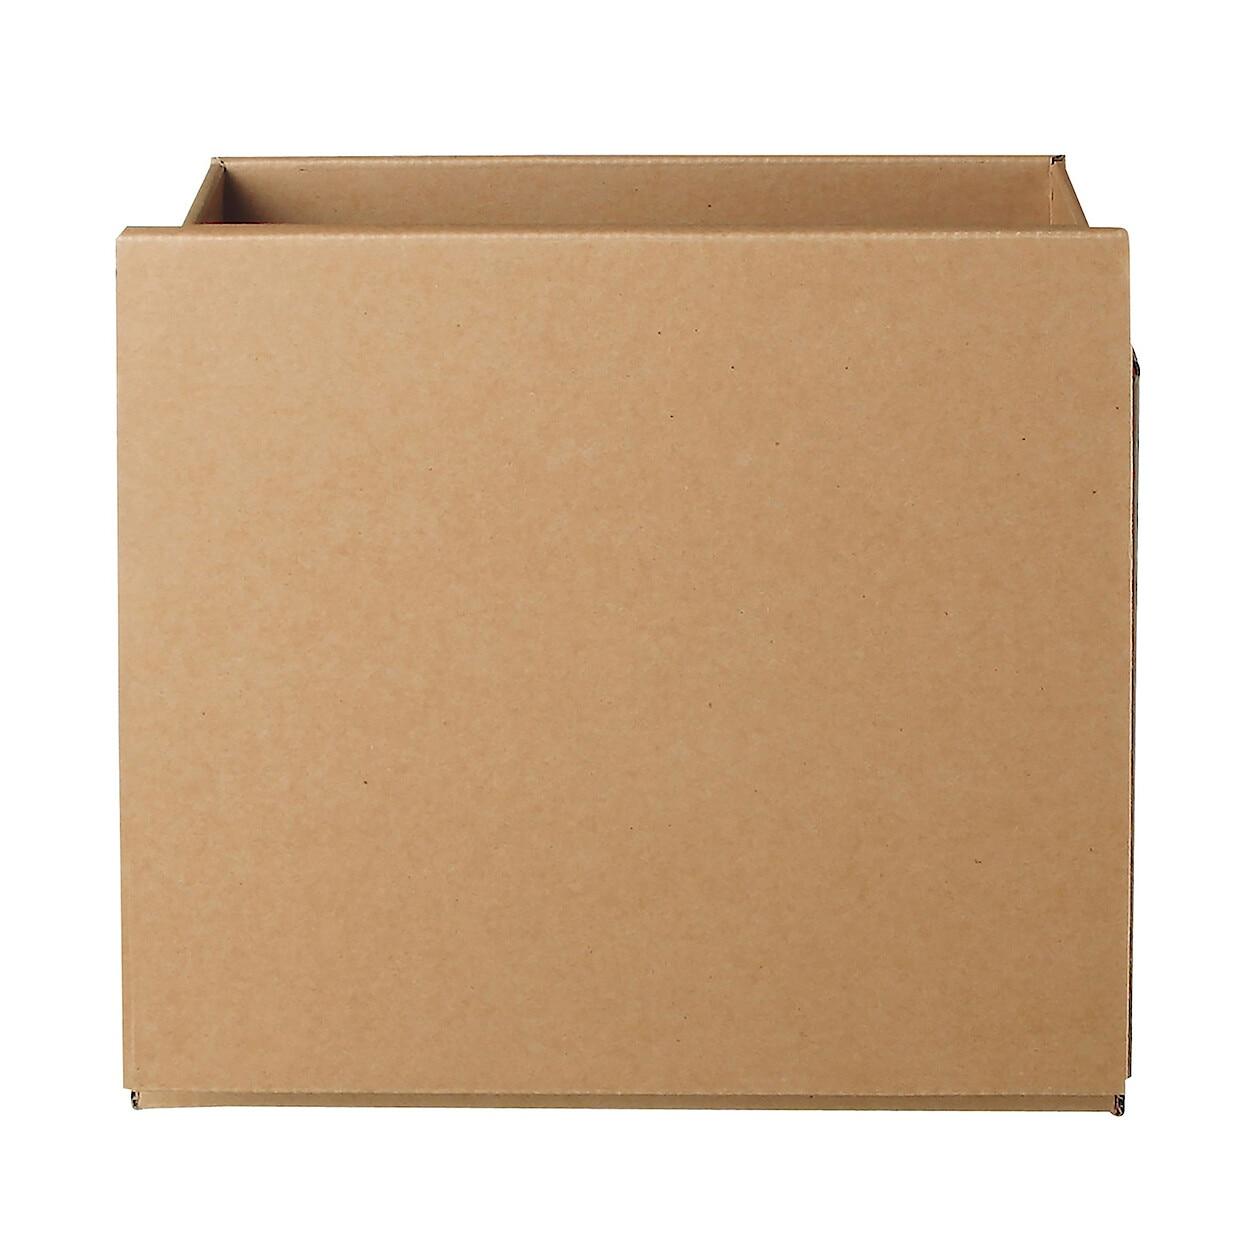 pulp board box cardboard box w34 d27 h34cm muji